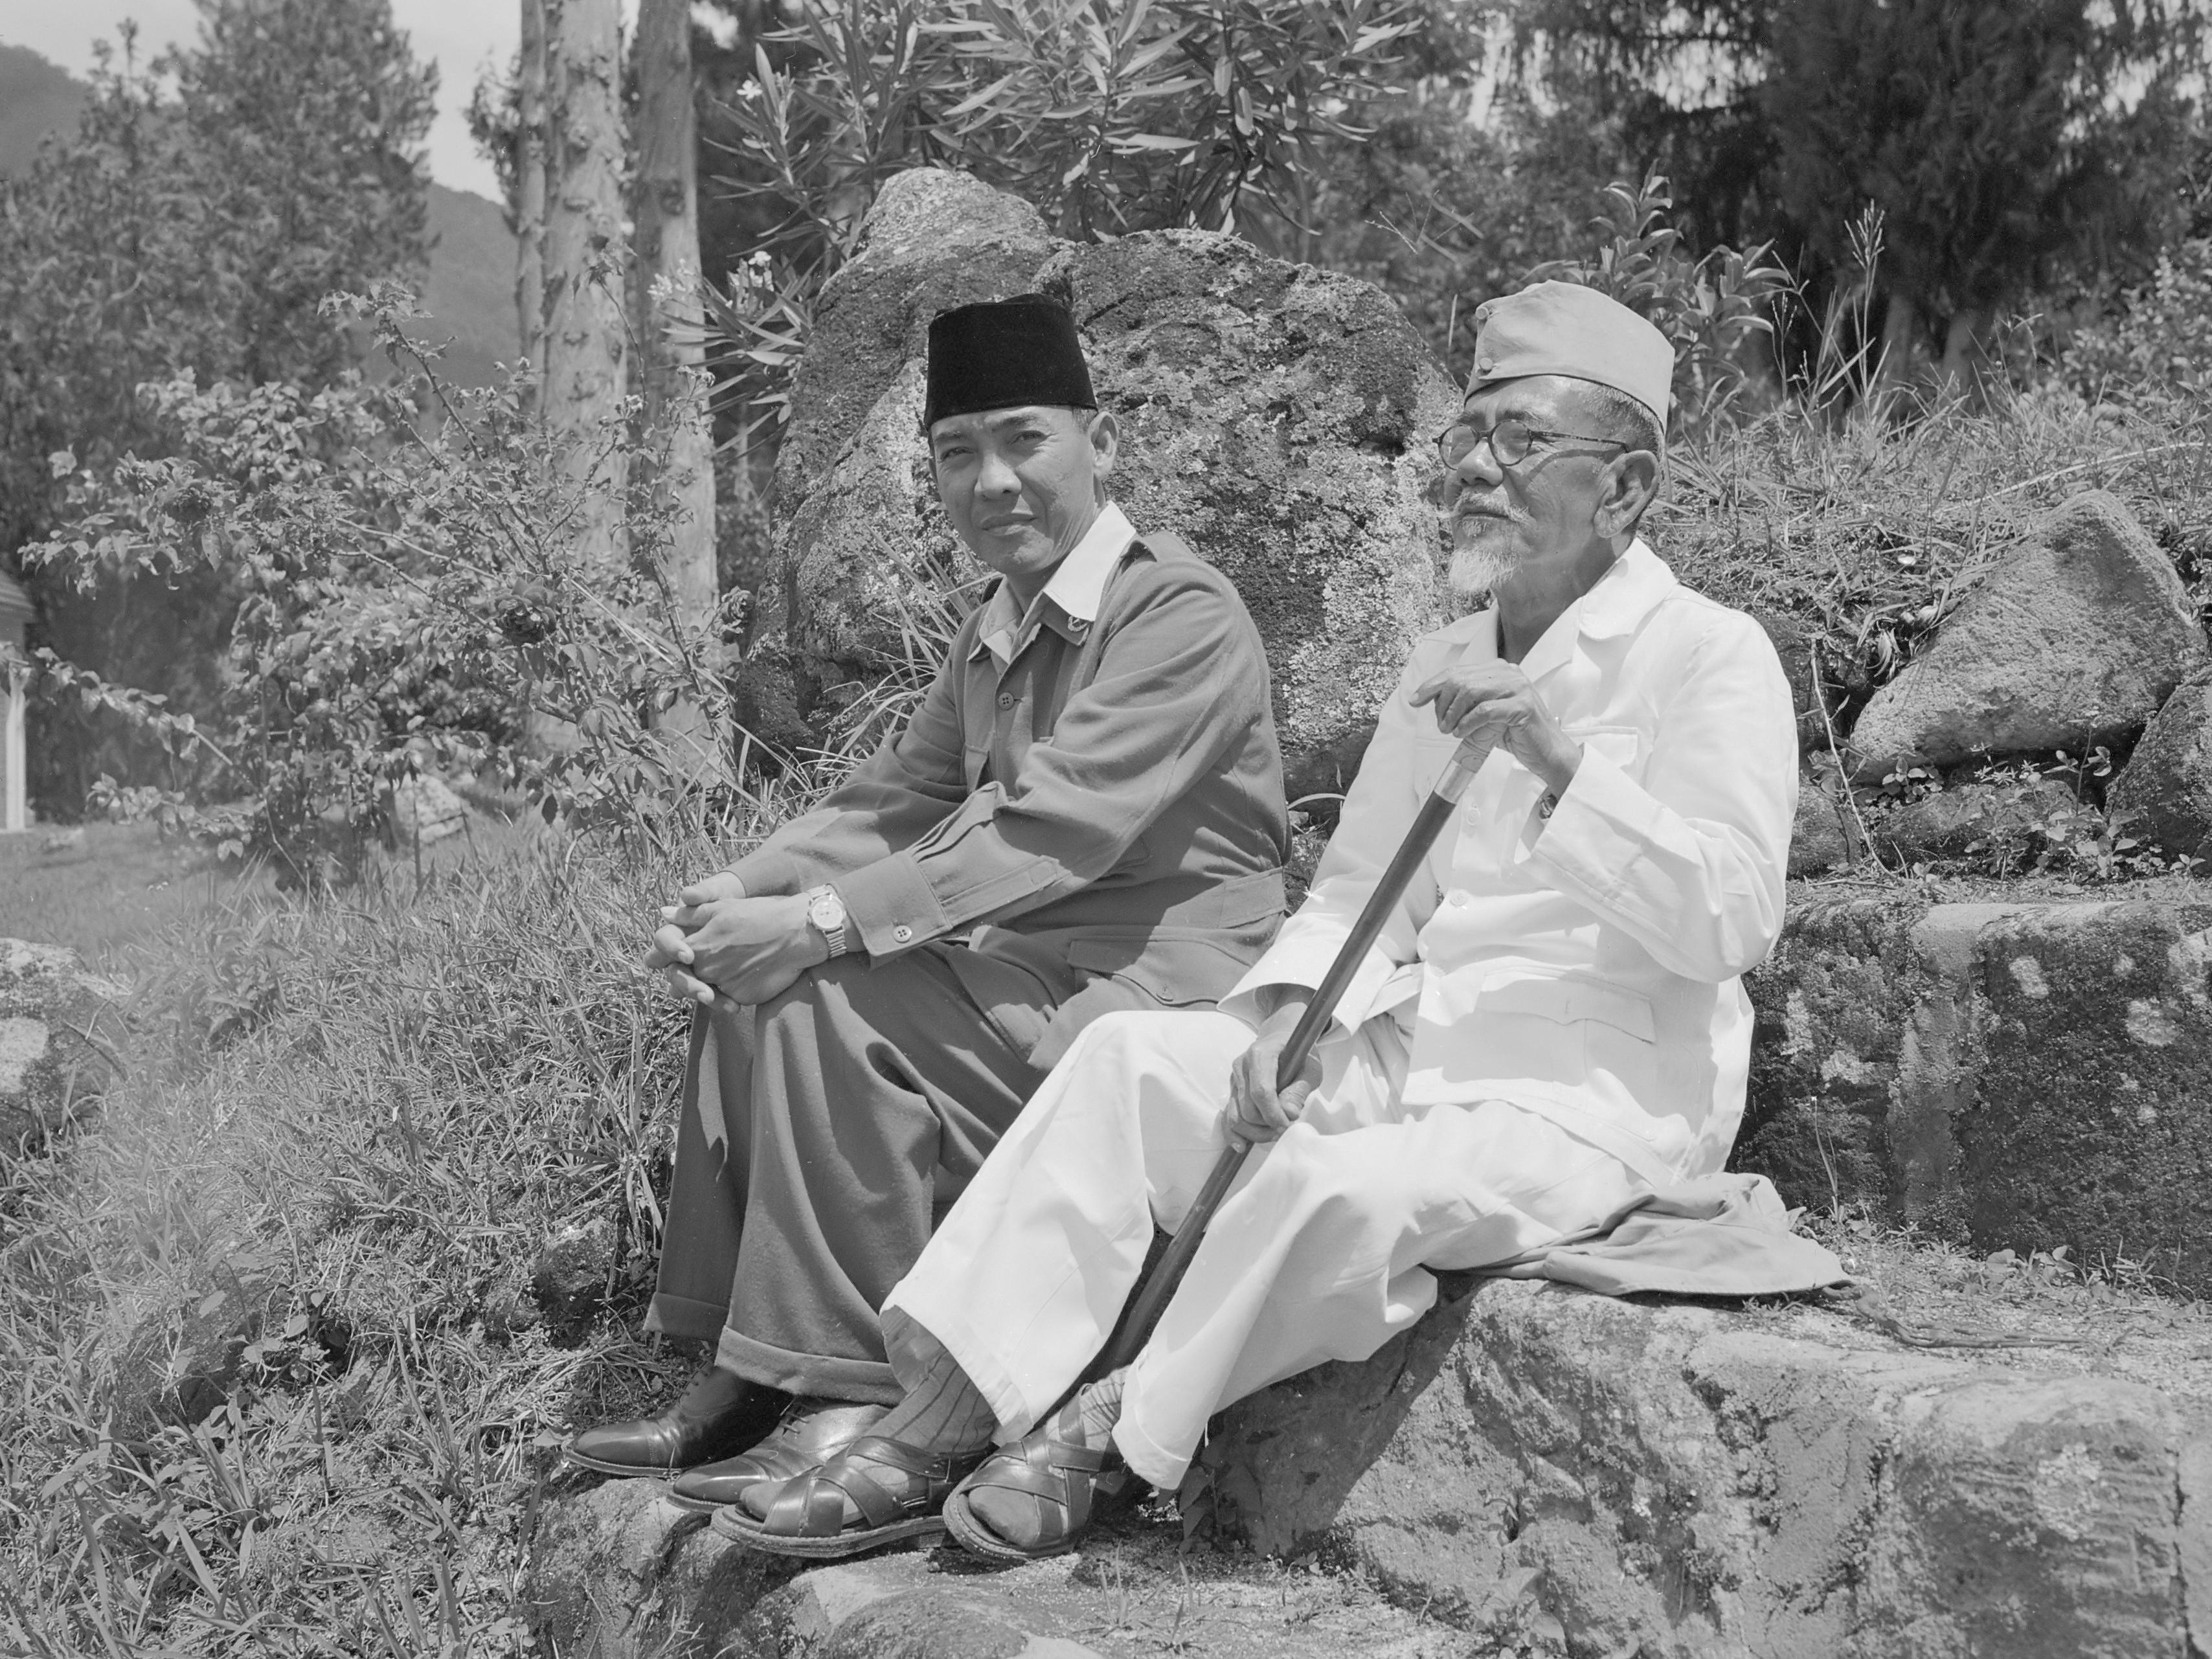 https://upload.wikimedia.org/wikipedia/commons/1/1e/COLLECTIE_TROPENMUSEUM_President_Soekarno_tijdens_een_wandeling_met_Hadji_Agus_Salim_TMnr_10018810.jpg